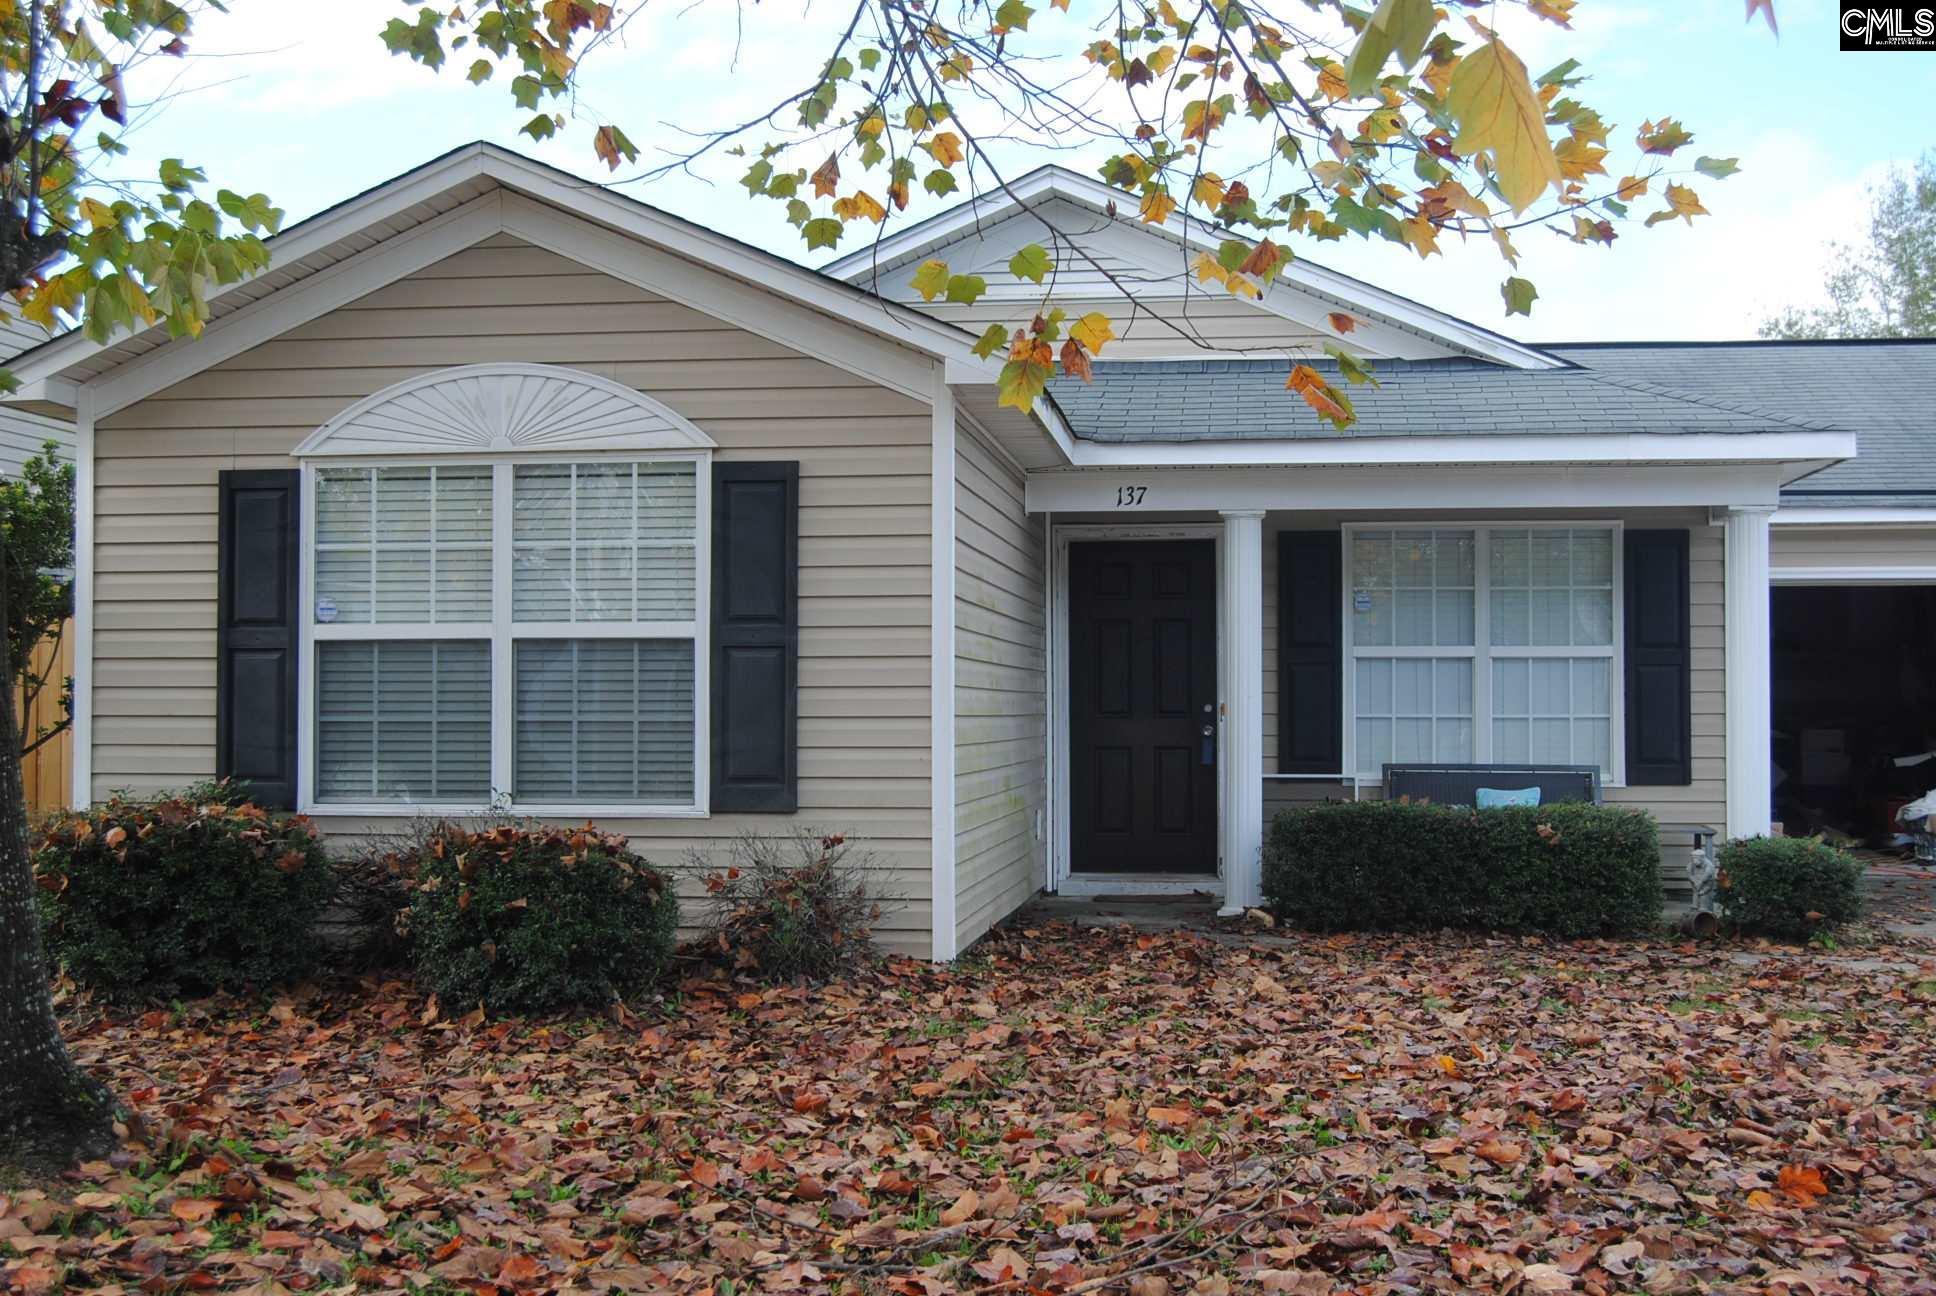 137 Crimson Oak Lexington, SC 29072